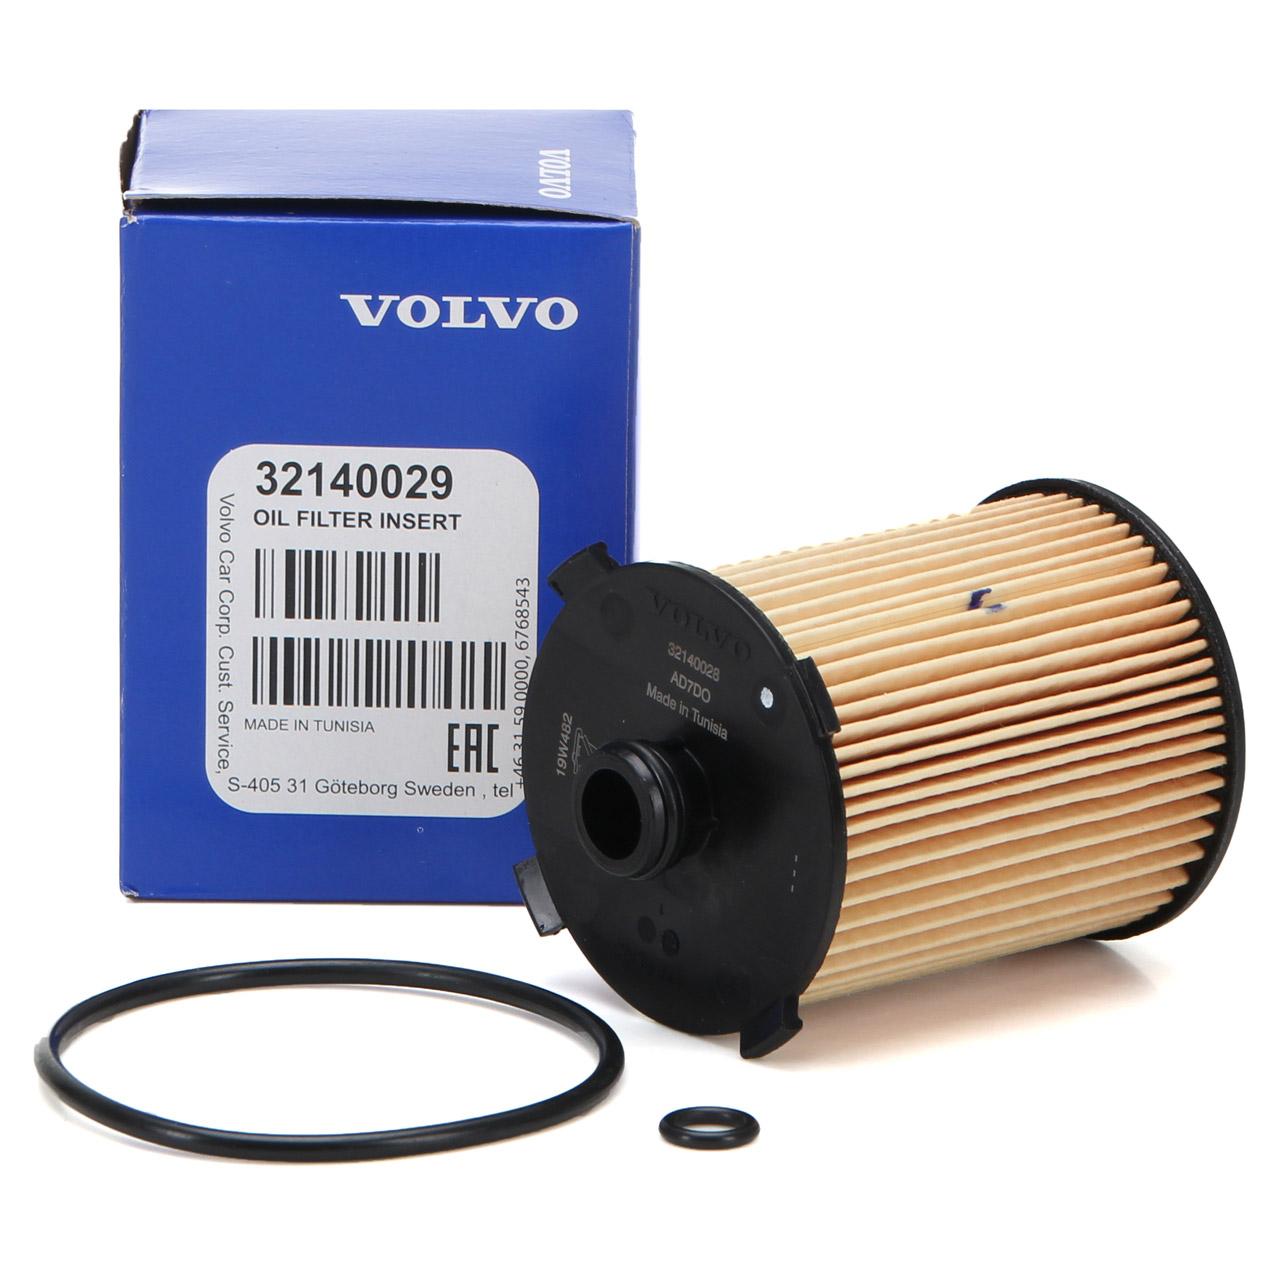 ORIGINAL Volvo Ölfilter S60 II S80 II V40 V60 V70 III XC60 XC70 II XC90 32140029